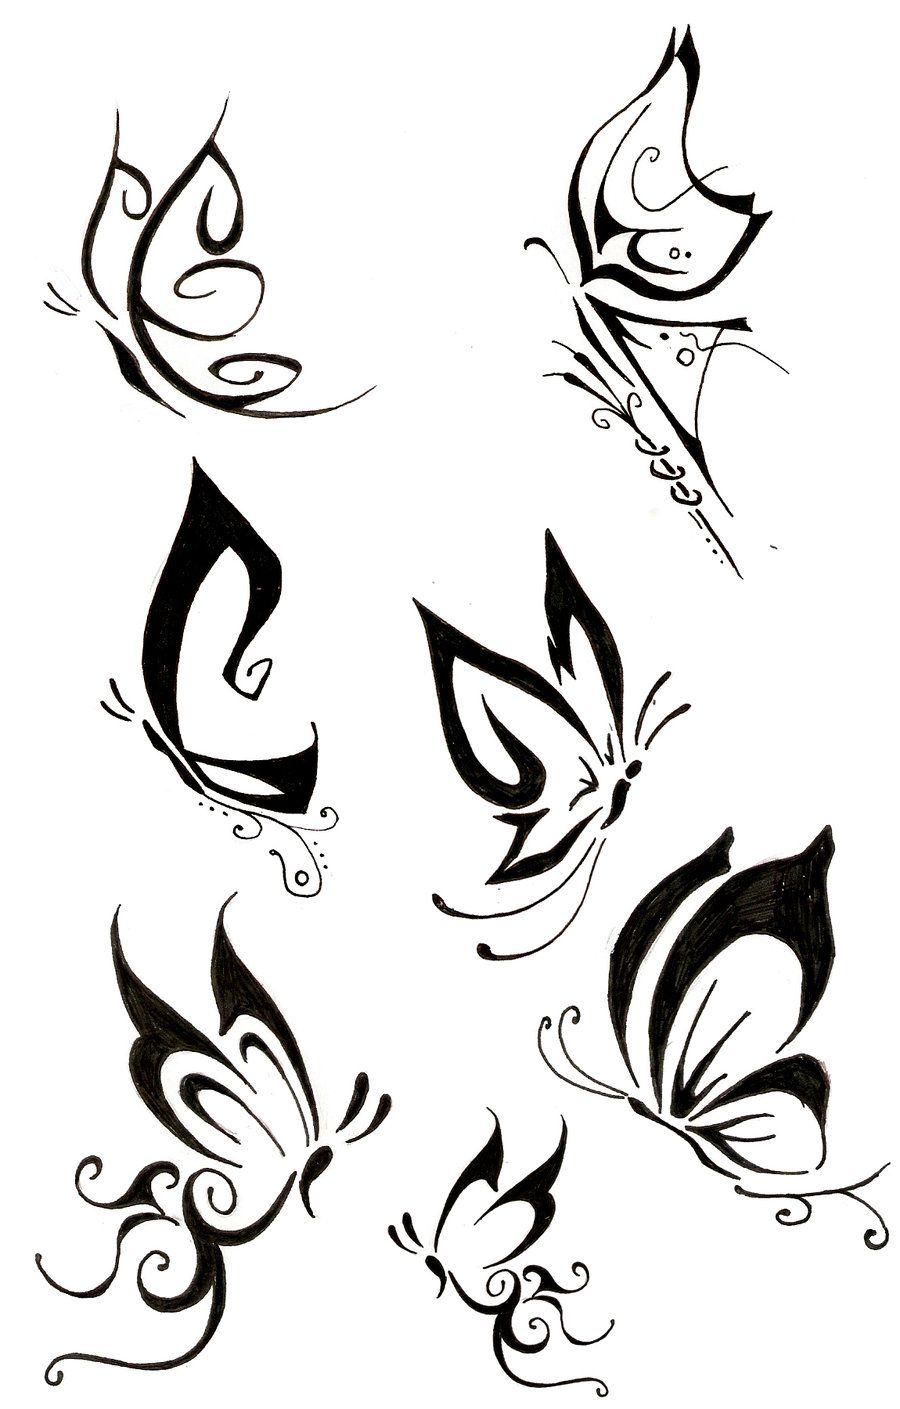 Butterfly Tattoo by THe-FoX-HounD.deviantart.com on @deviantART